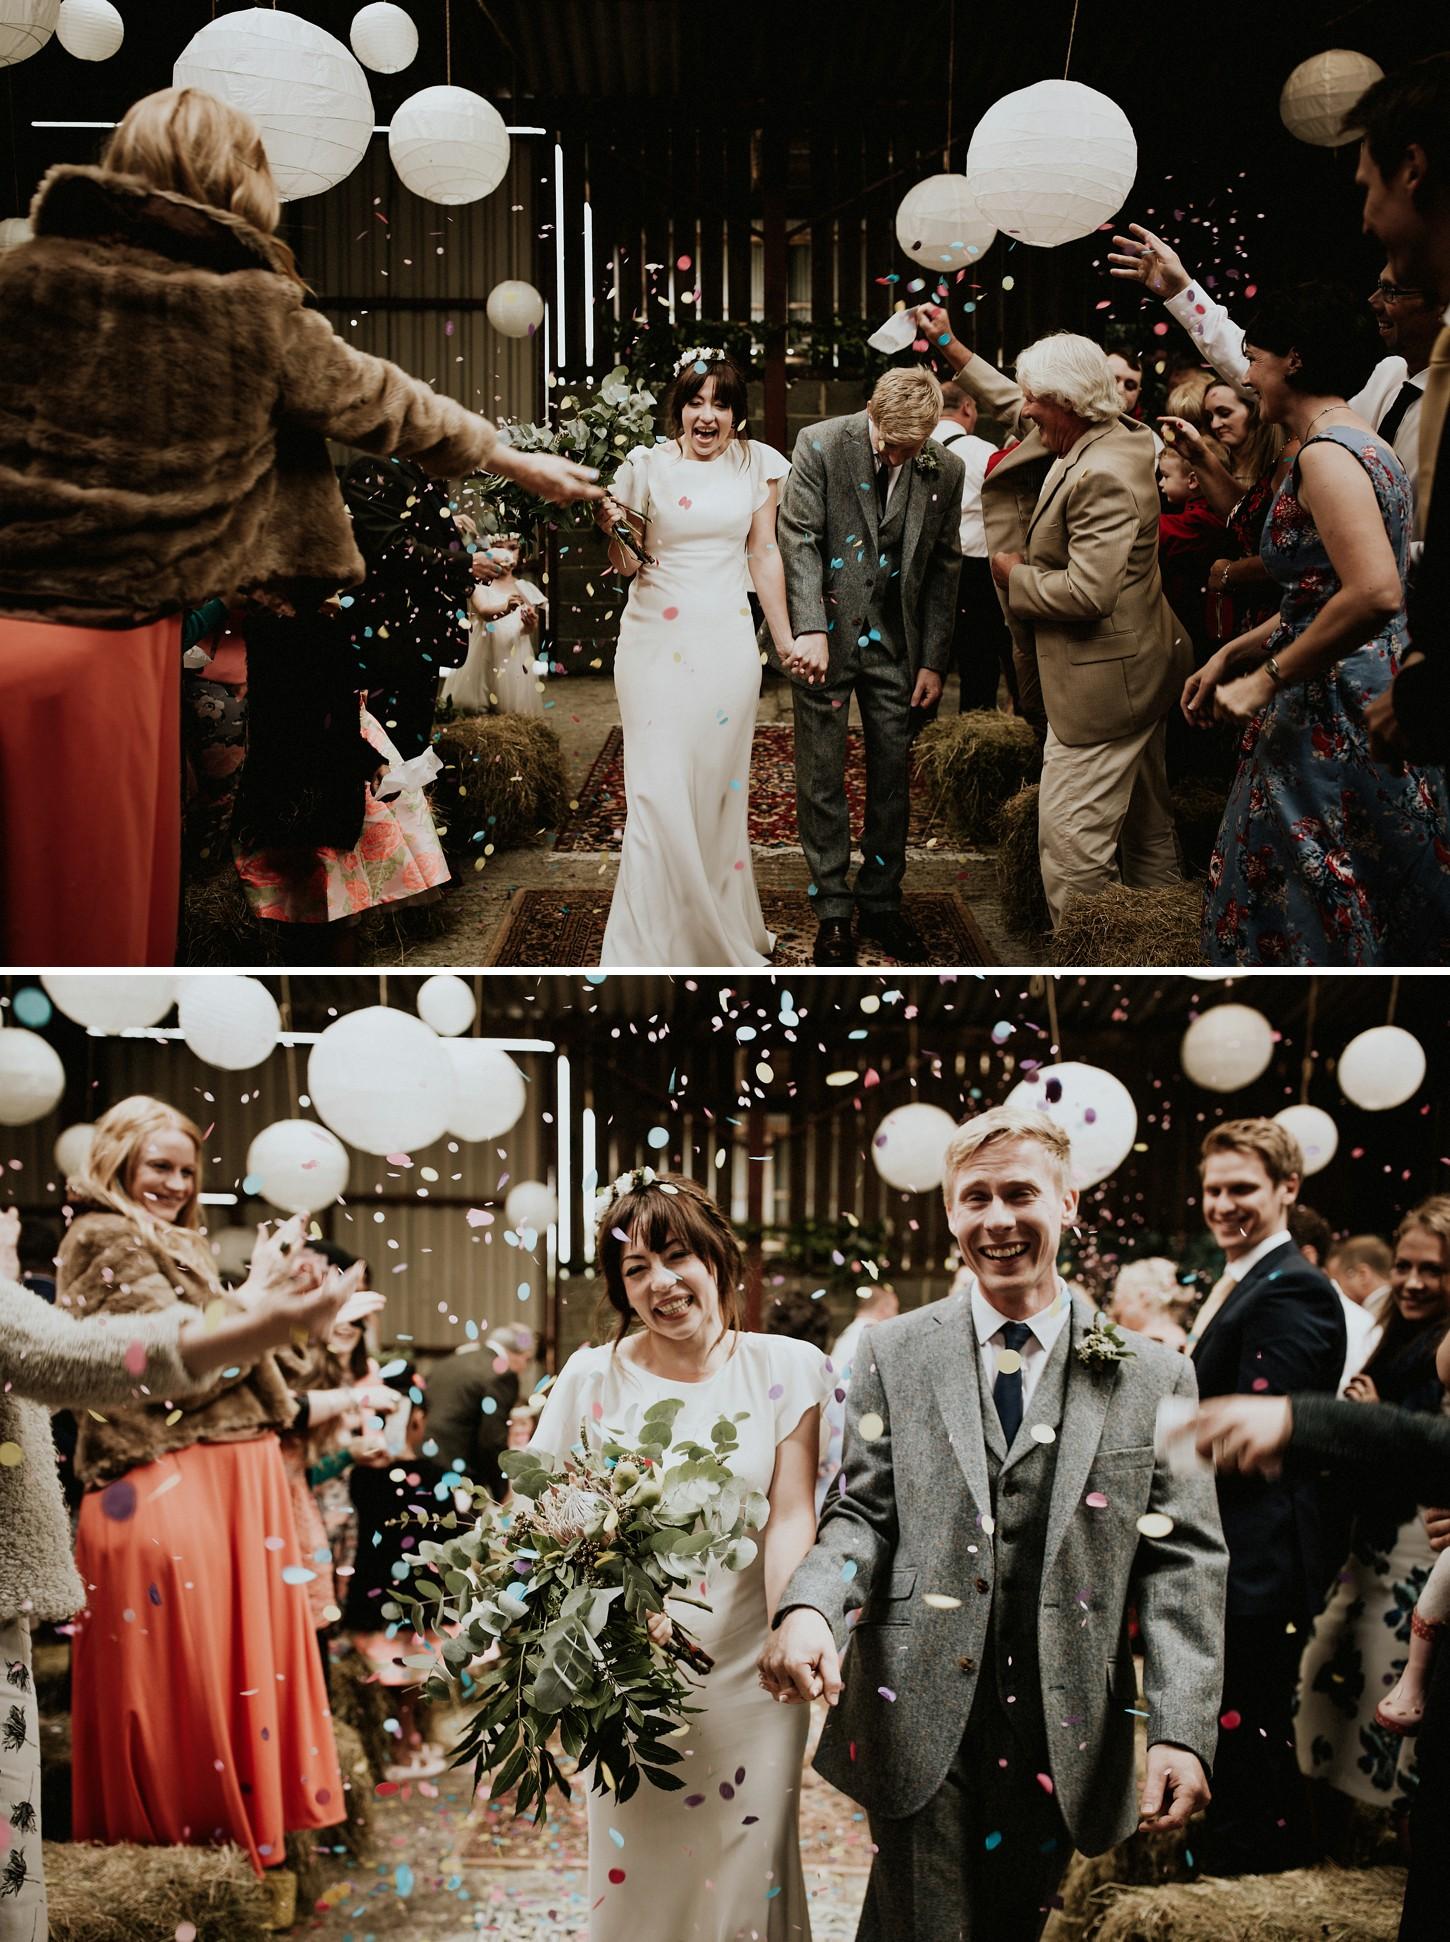 Dolau-Sheep-Farm-Wedding-Wales-United-Kingdom-027